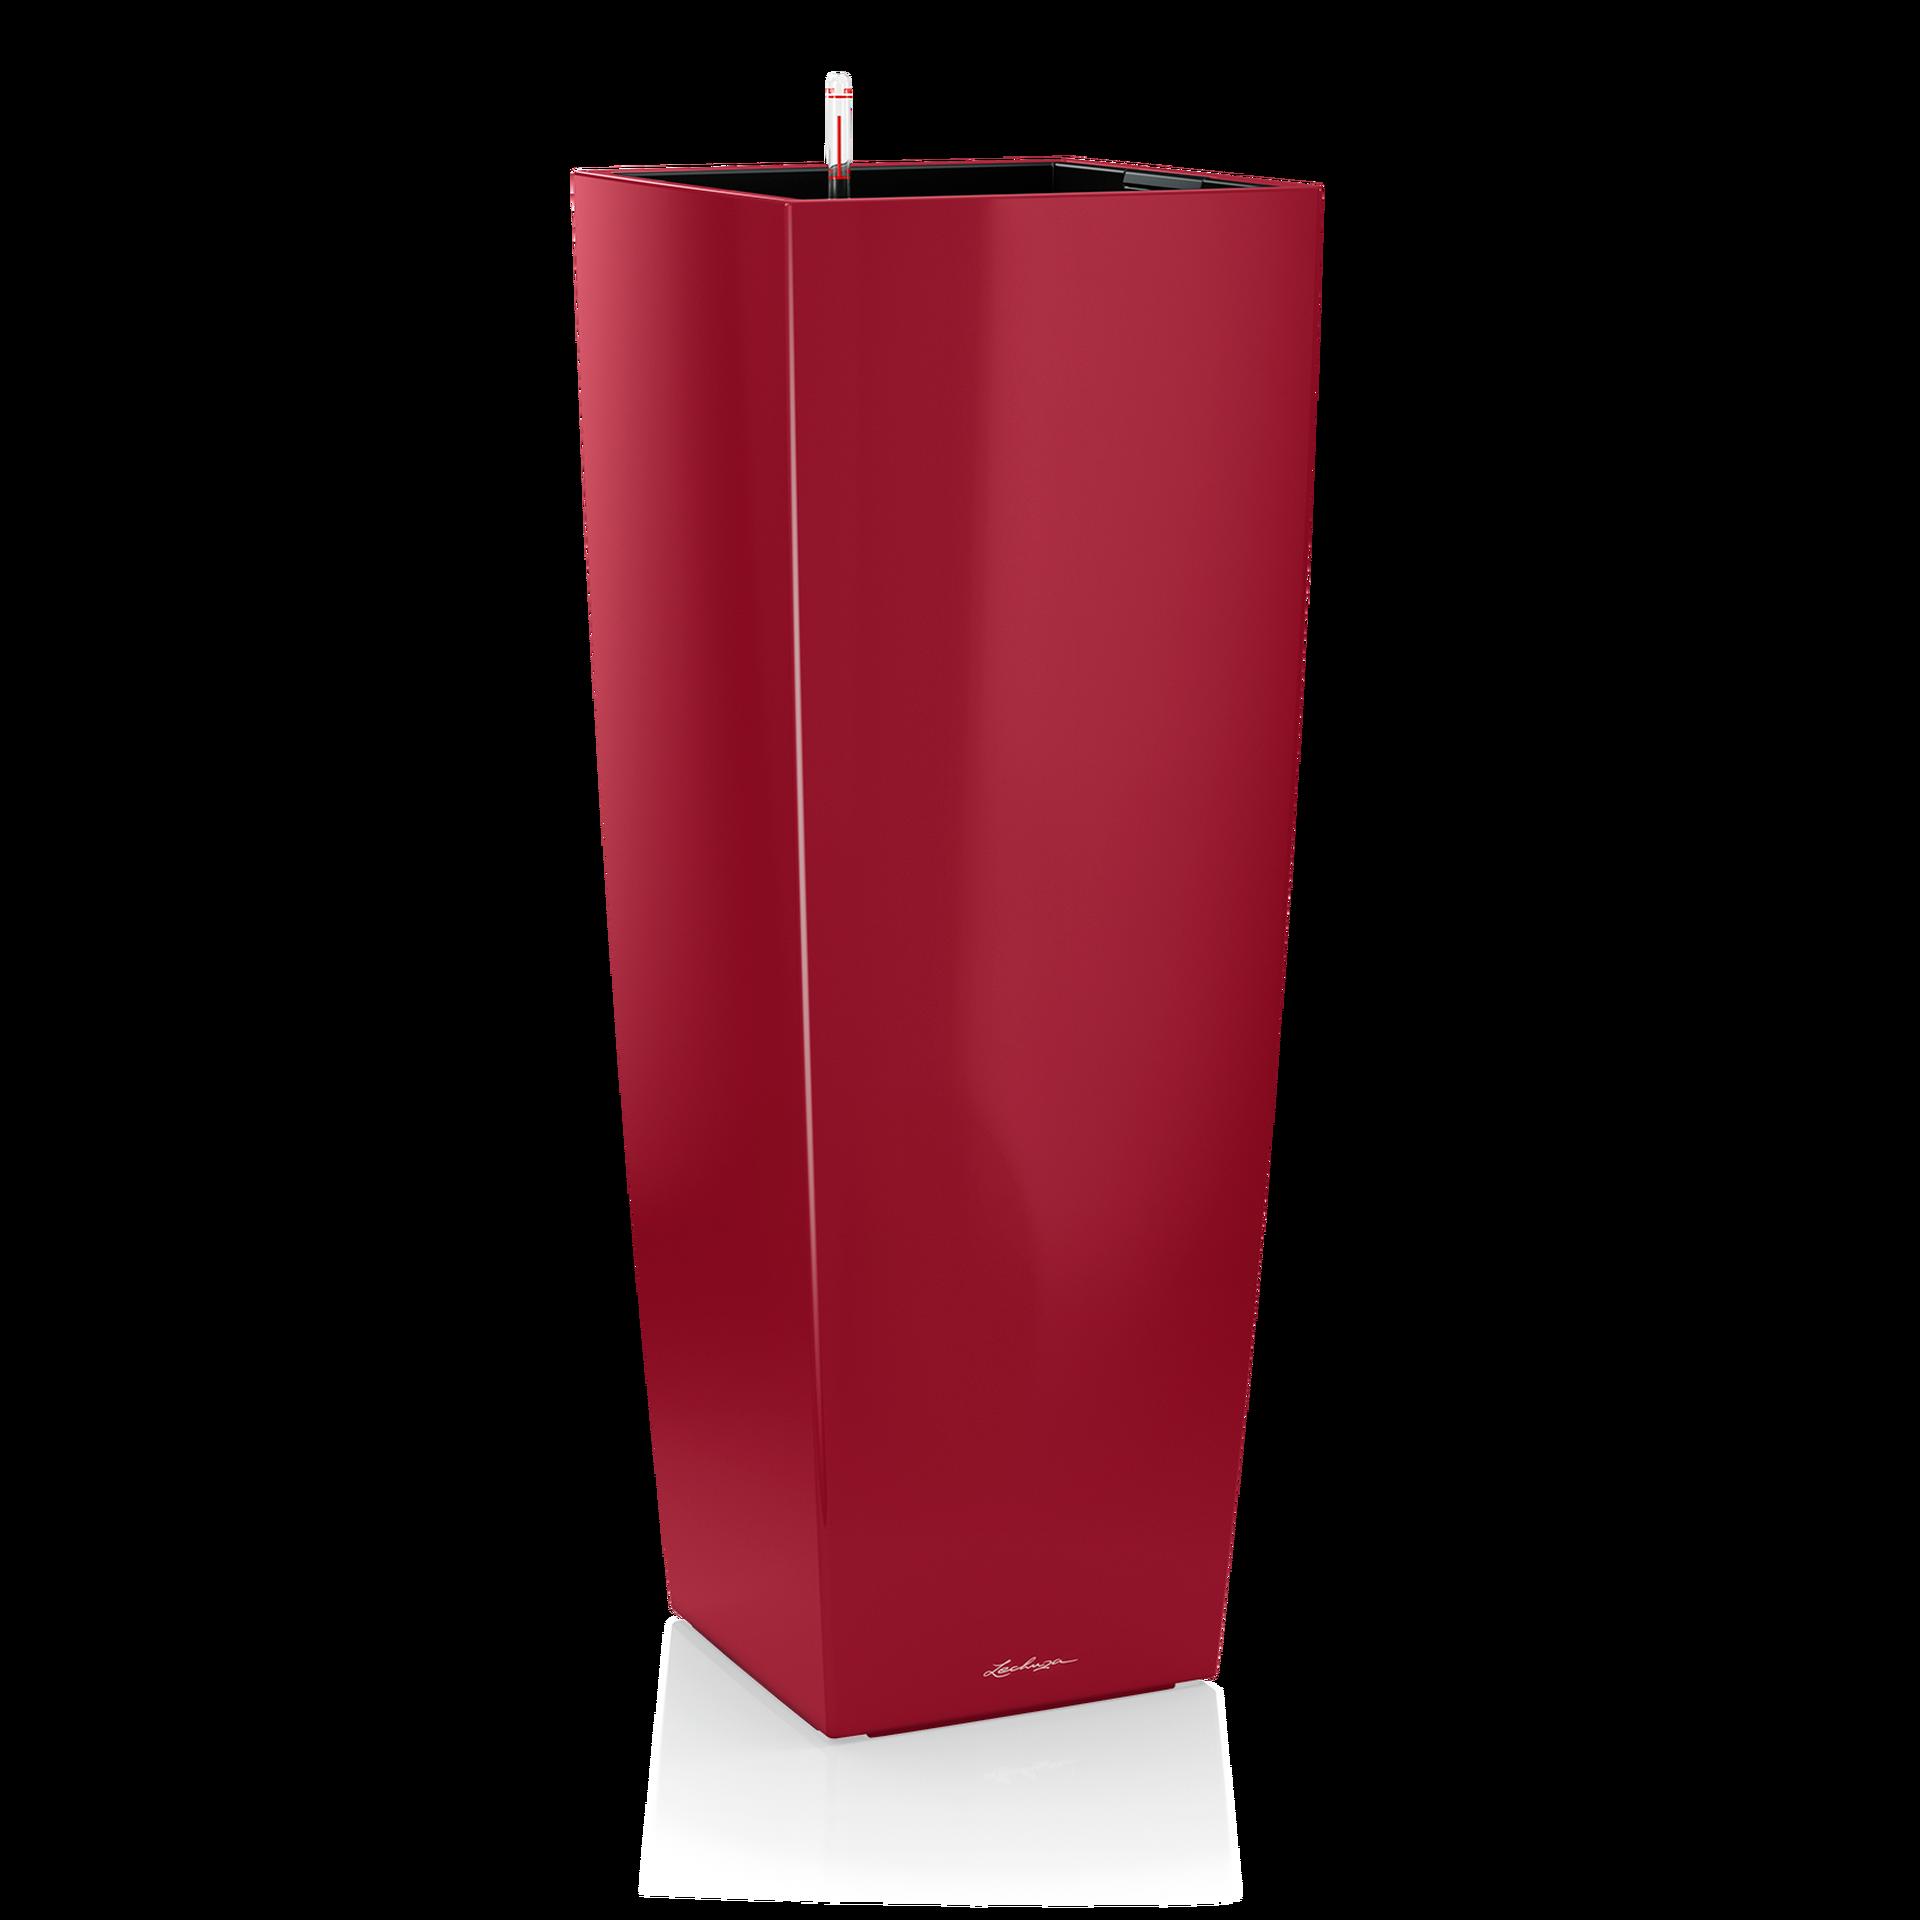 CUBICO ALTO scarlet rot hochglanz